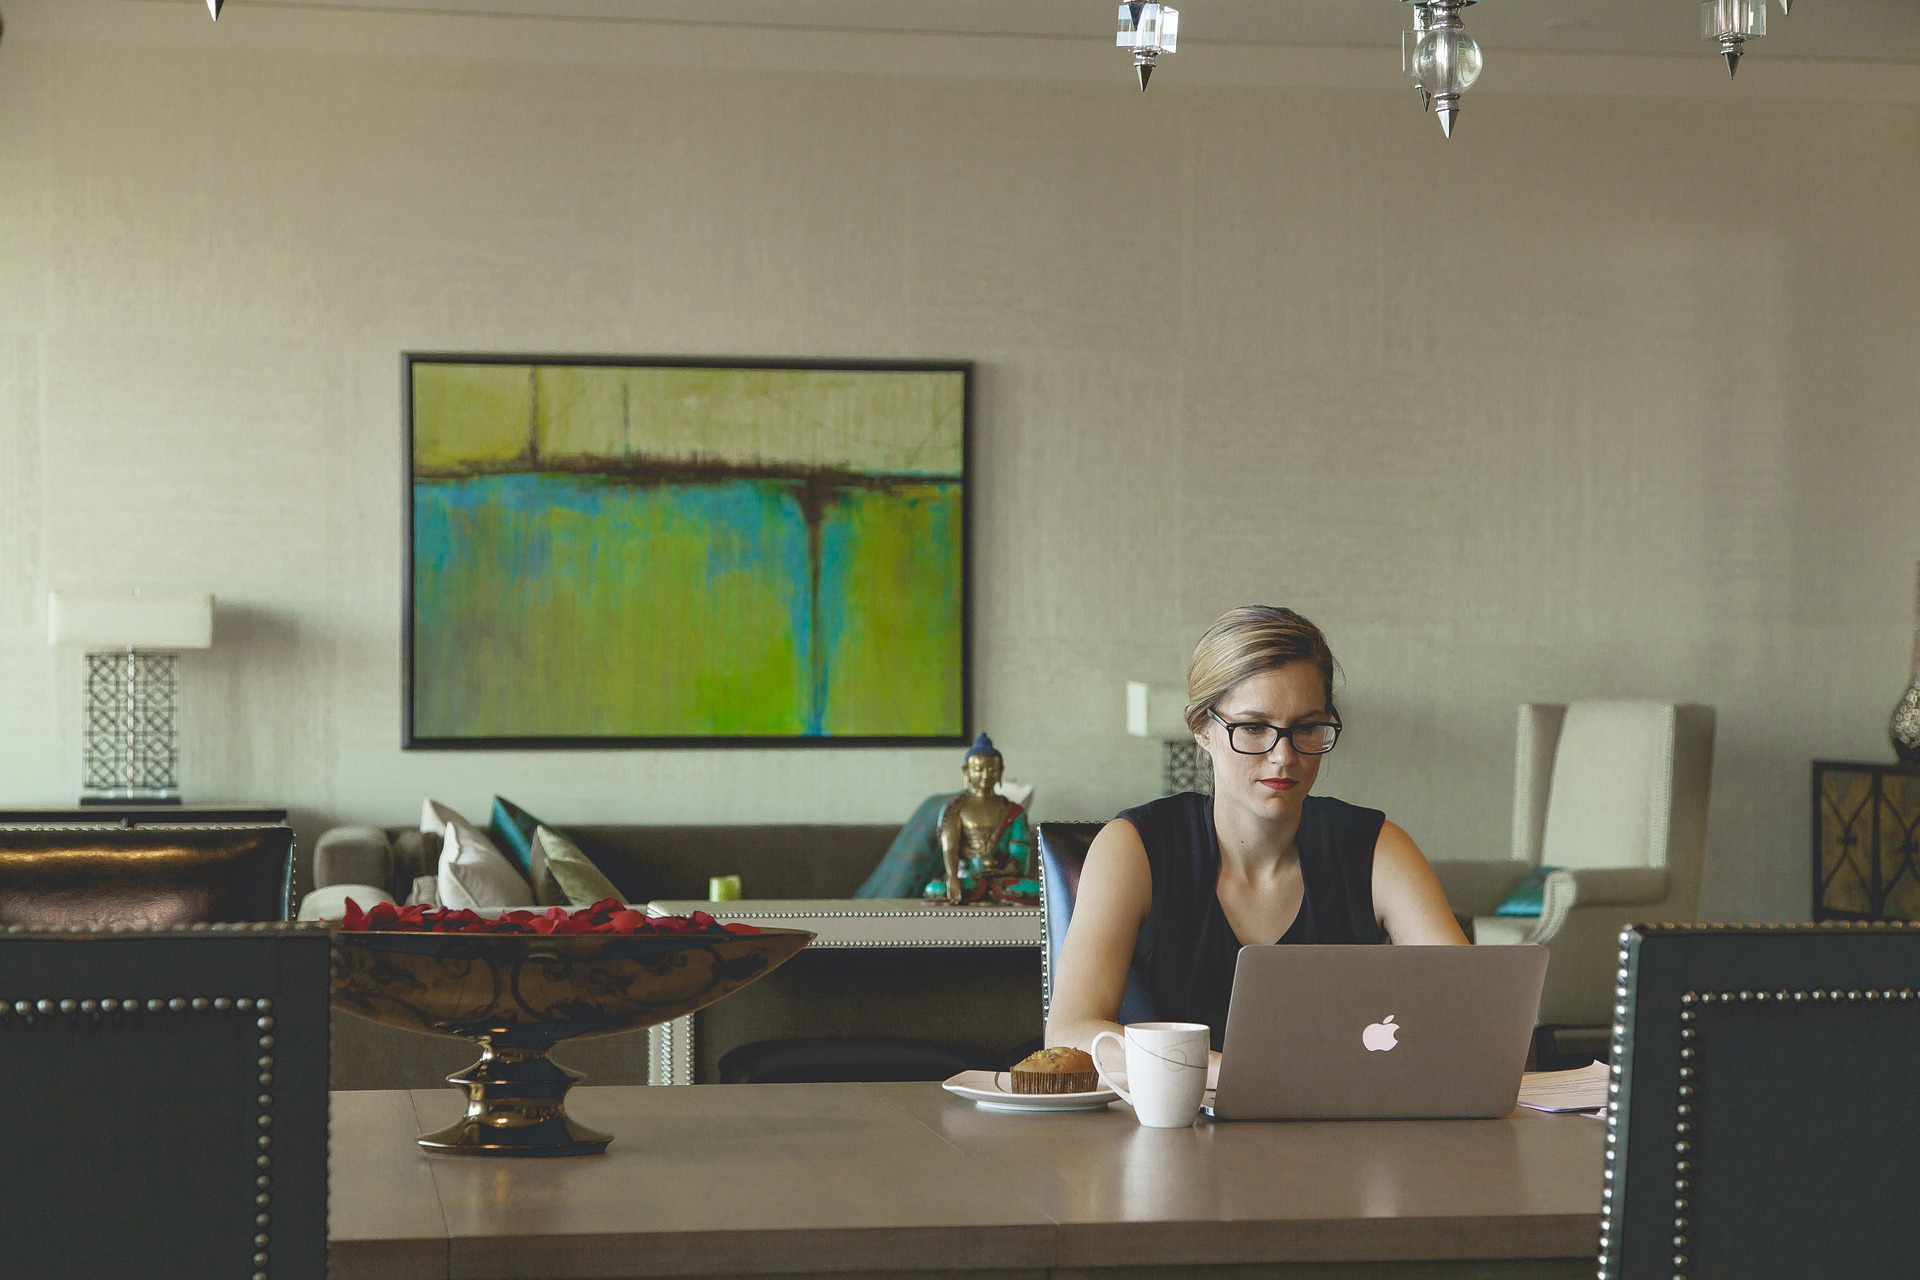 boost challenge defi gestion organisation planification femme entrepreneure leader manager maman